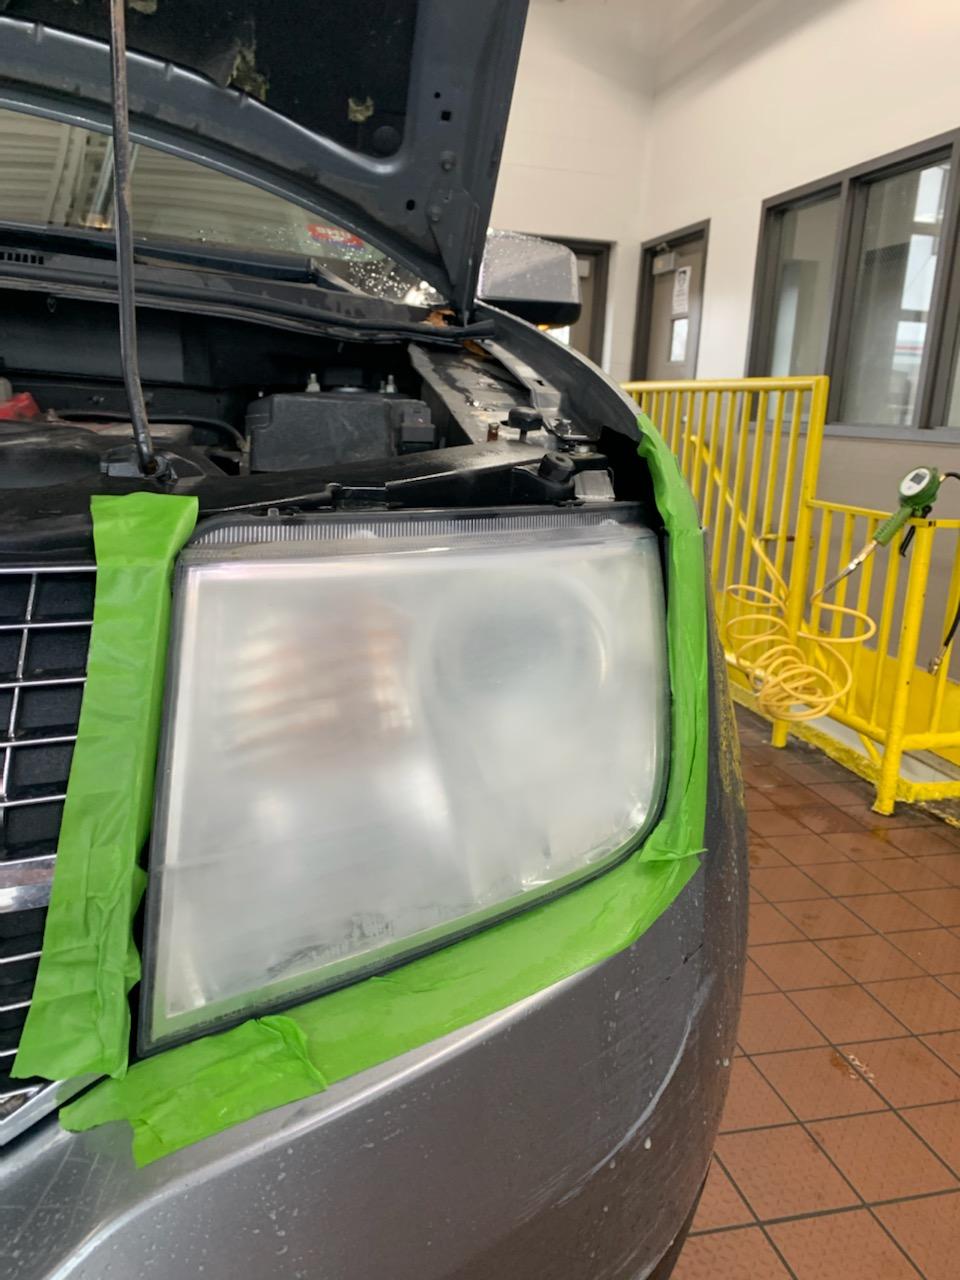 Jiffy Lube - car repair  | Photo 3 of 8 | Address: 1534 Vierling Dr E, Shakopee, MN 55379, USA | Phone: (952) 496-0922